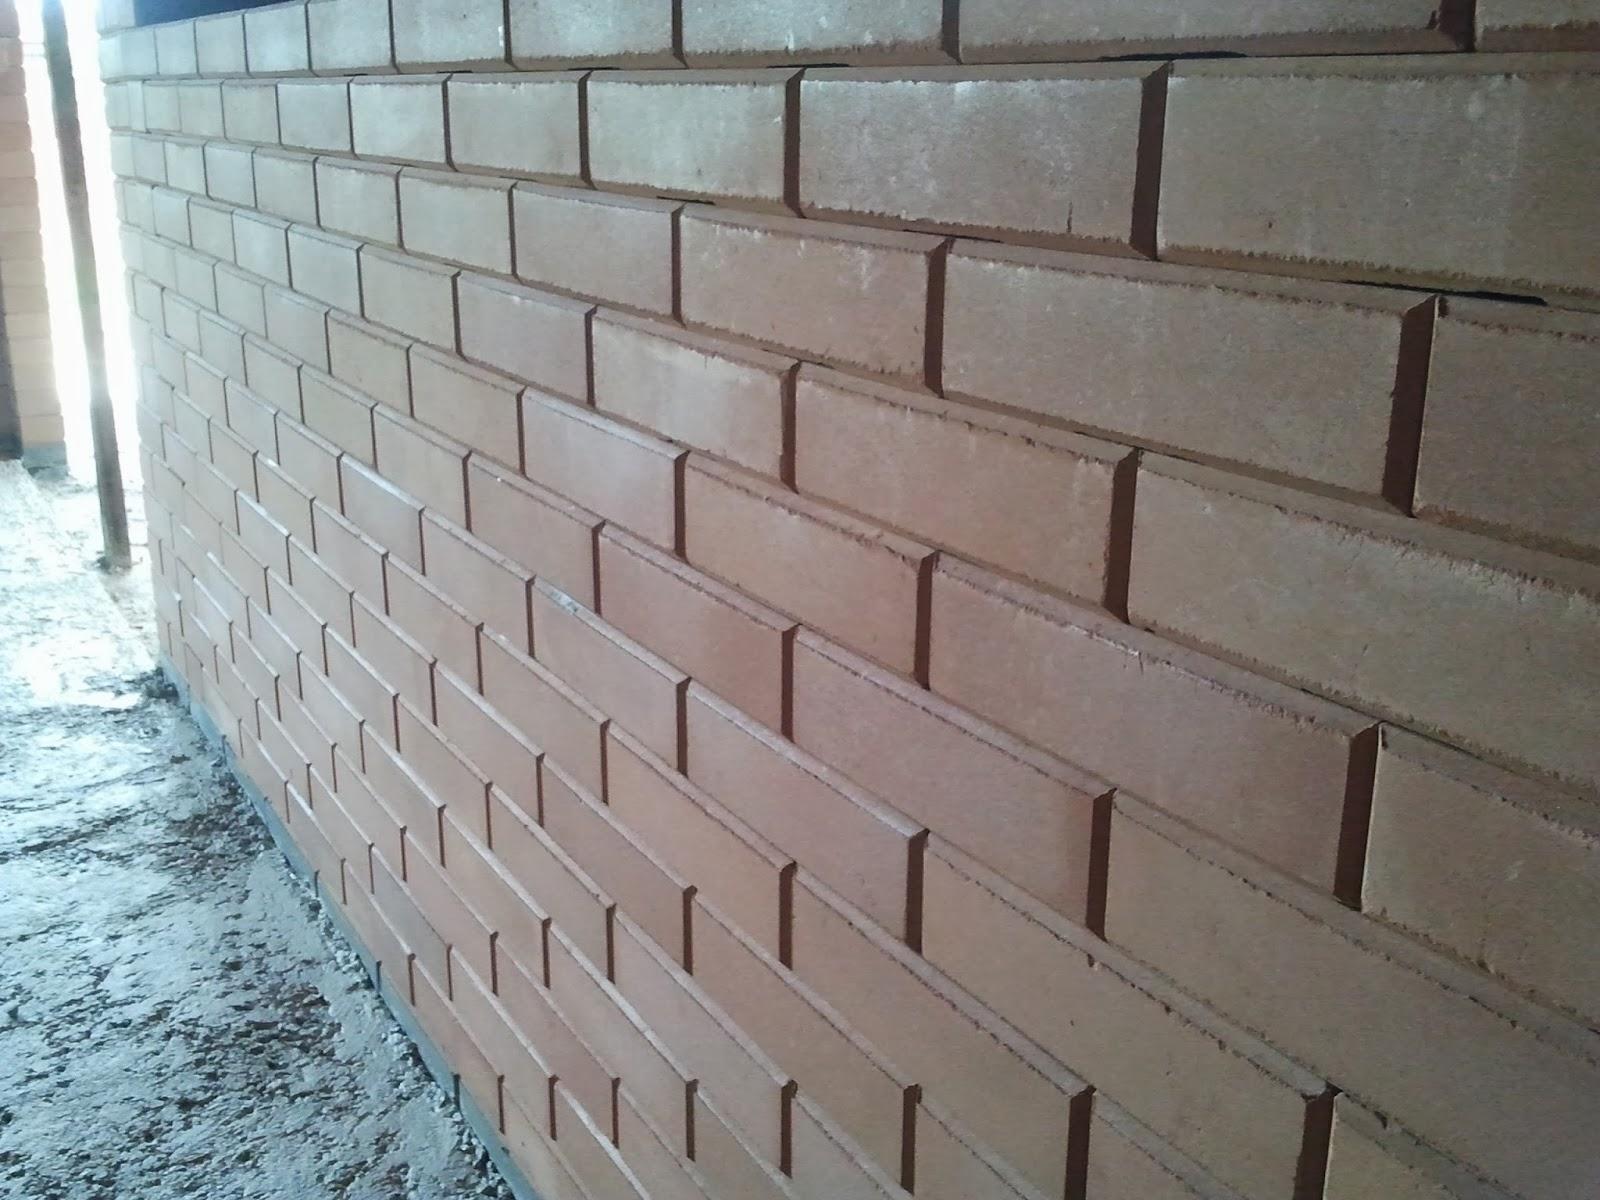 Construindo e Ampliando com Tijolo Solo cimento / Ecológico  #4B6470 1600x1200 Banheiro Com Tijolo Ecologico